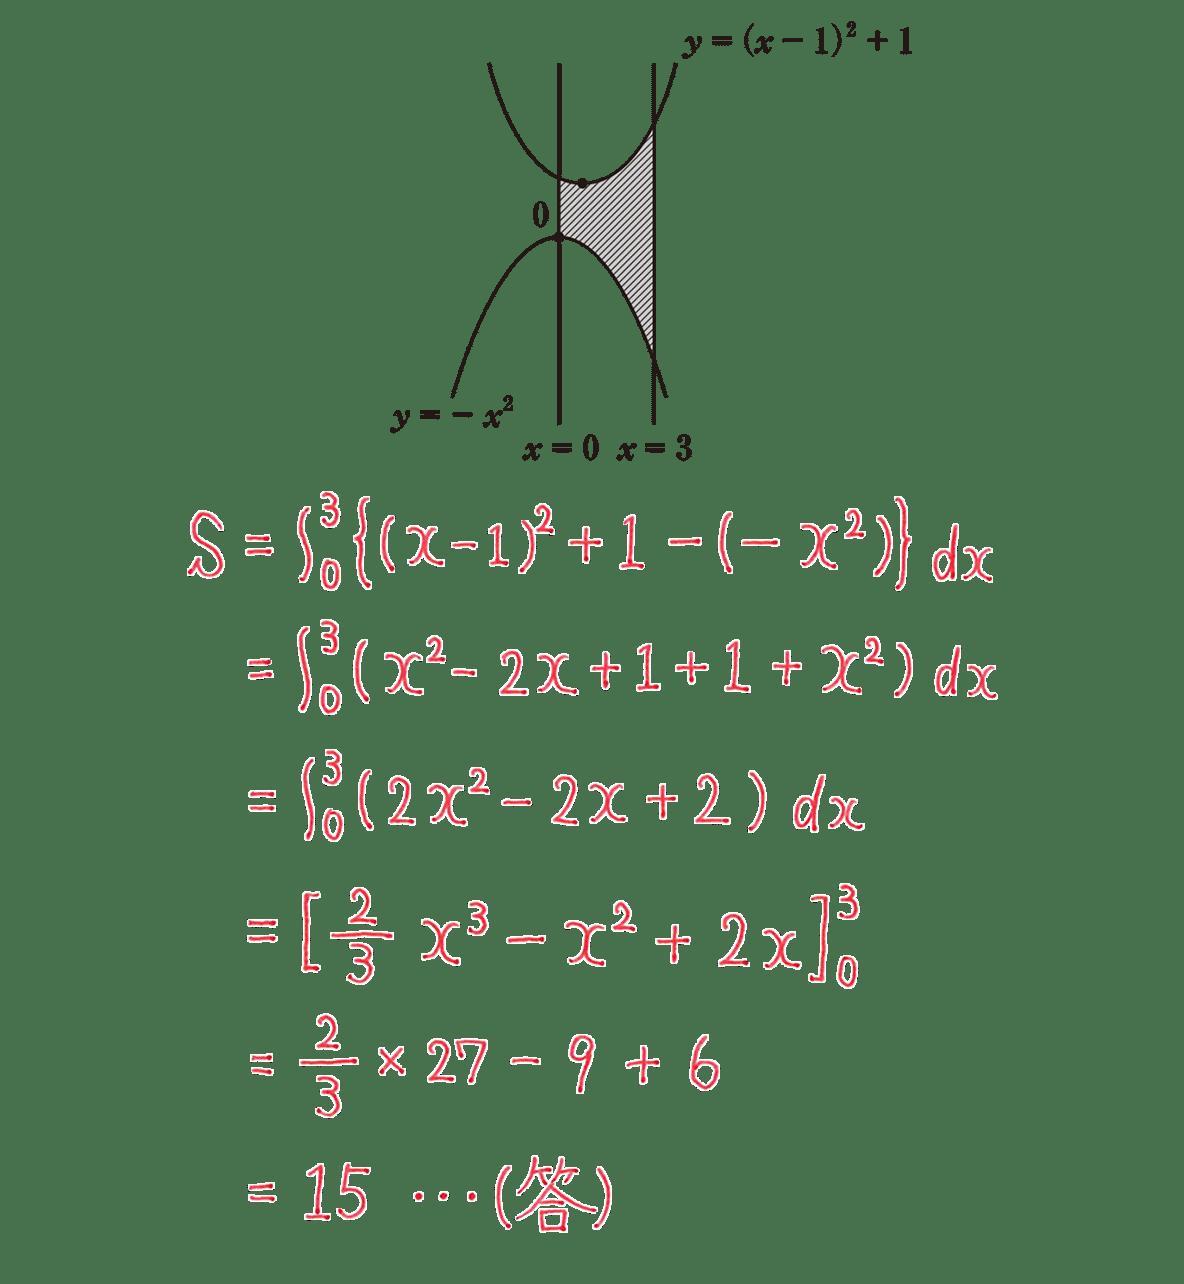 高校数学Ⅱ 微分法と積分法24 練習 答え